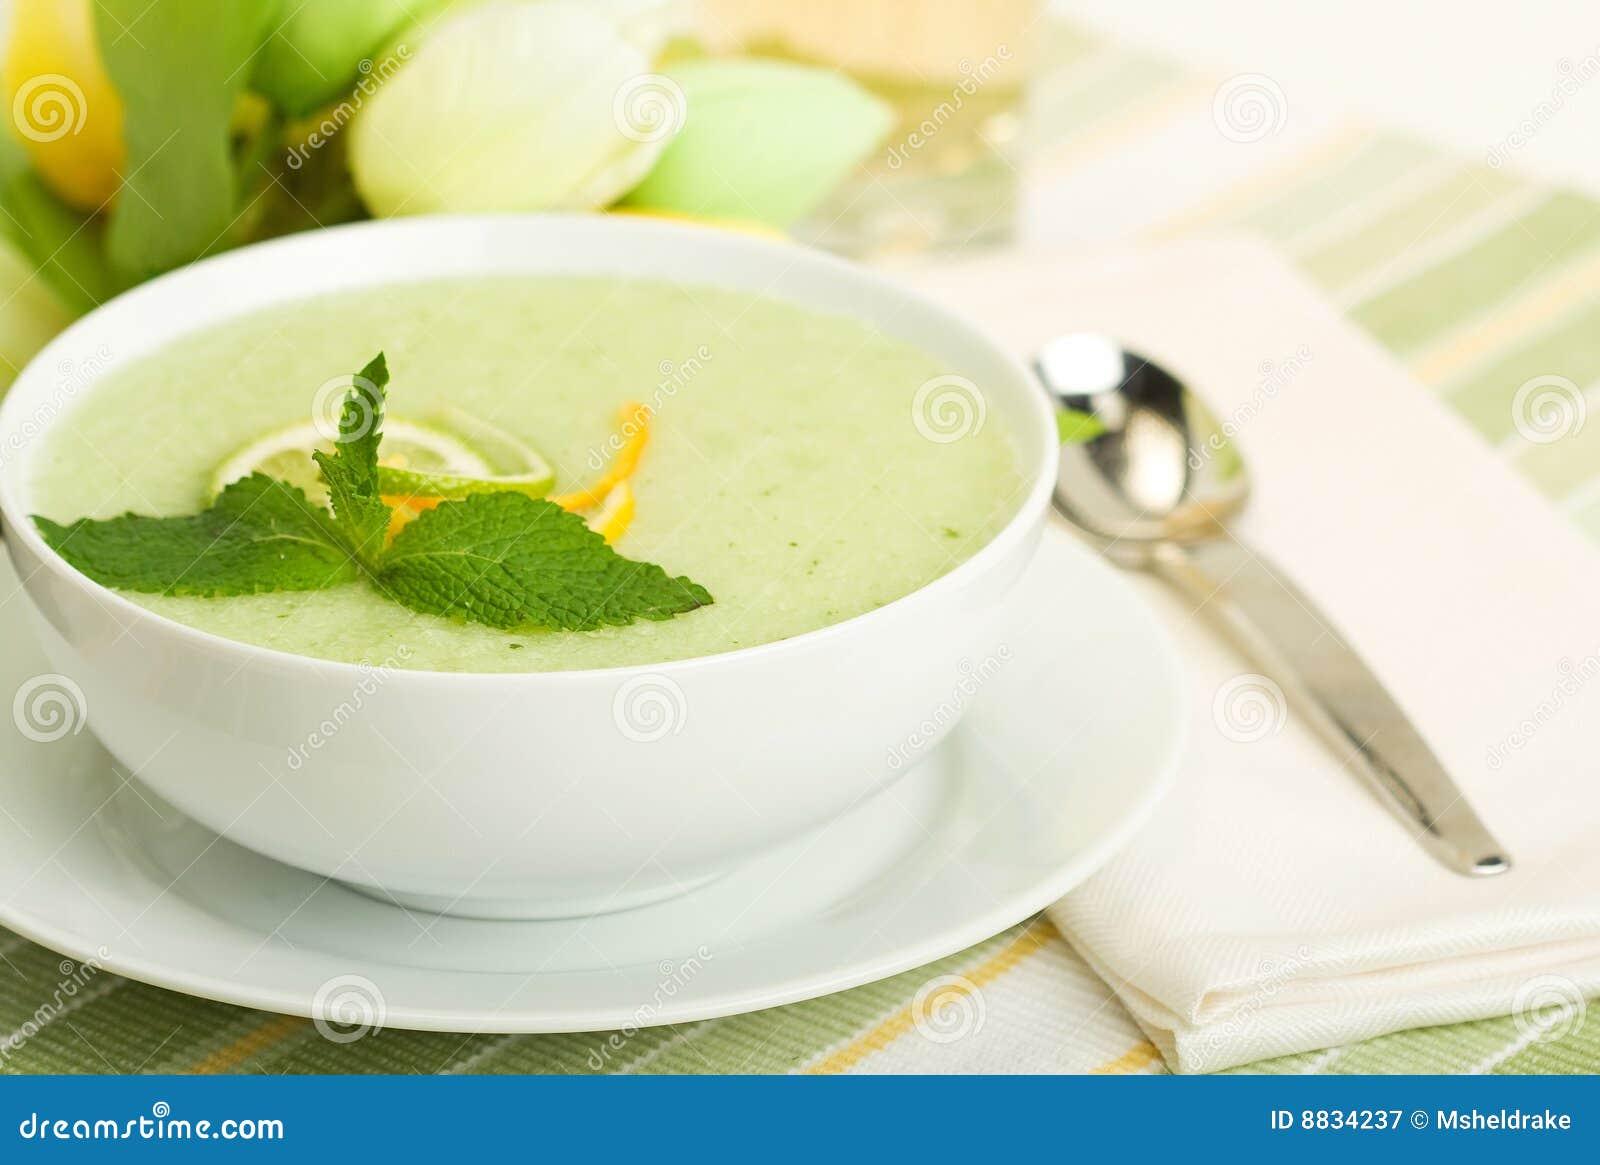 potage frais